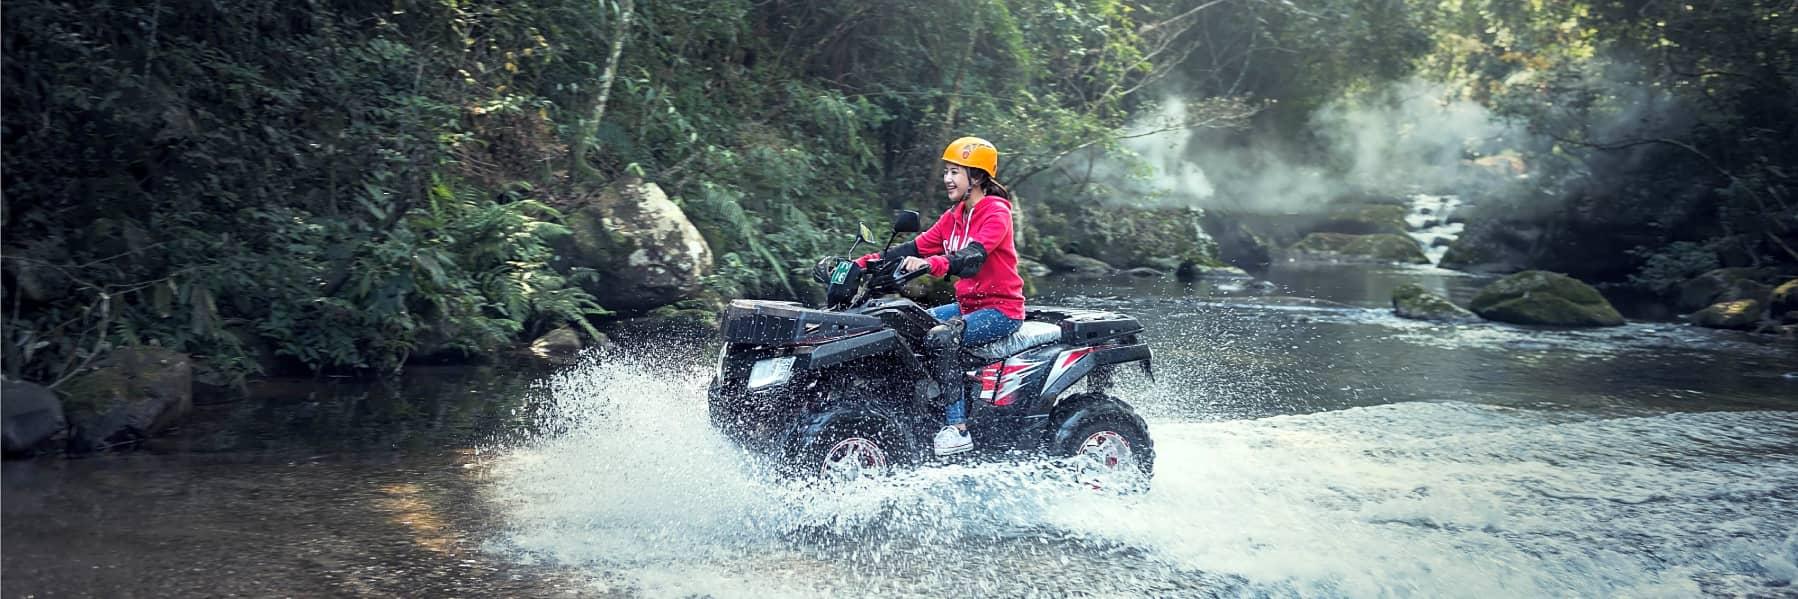 Ubud Monkey Forest & Tibumana Waterfall ATV Tour – Full Day gallery